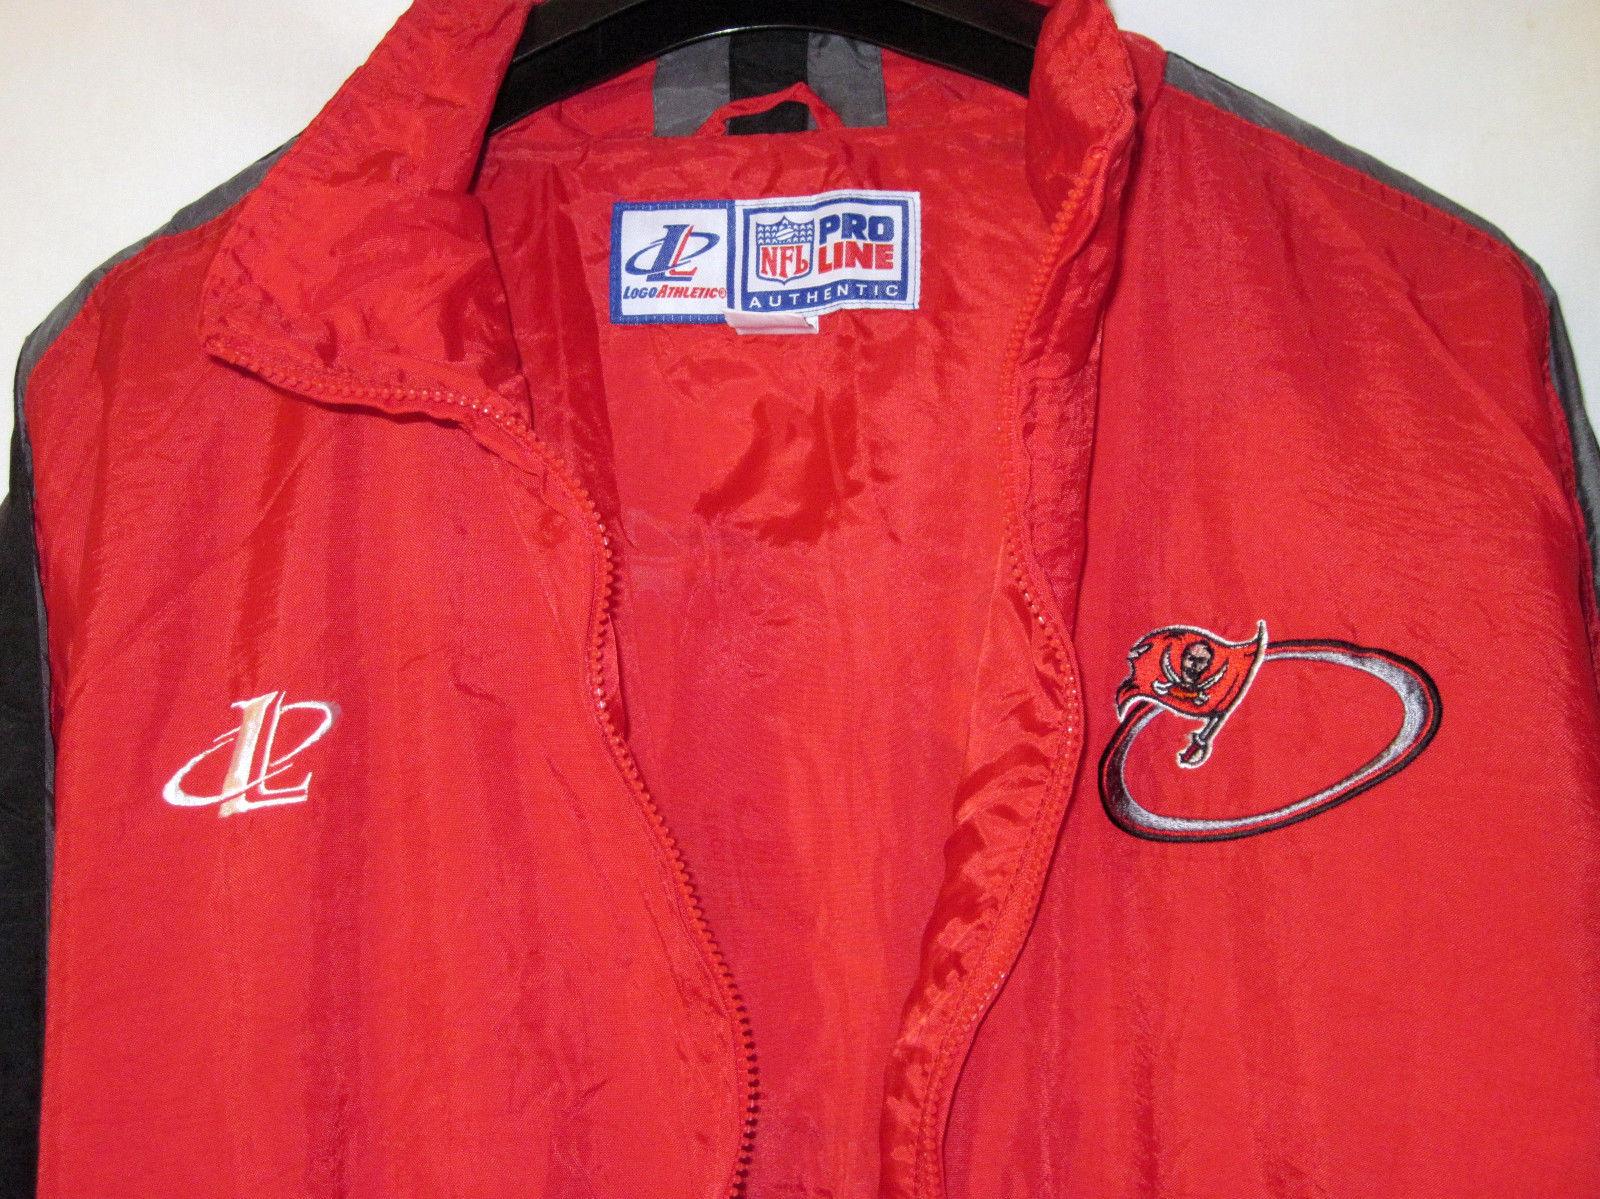 NFL Pro Line Authentic Logo AthleticTampa Bay Buccaneers nylon jacket Zip Up L image 3